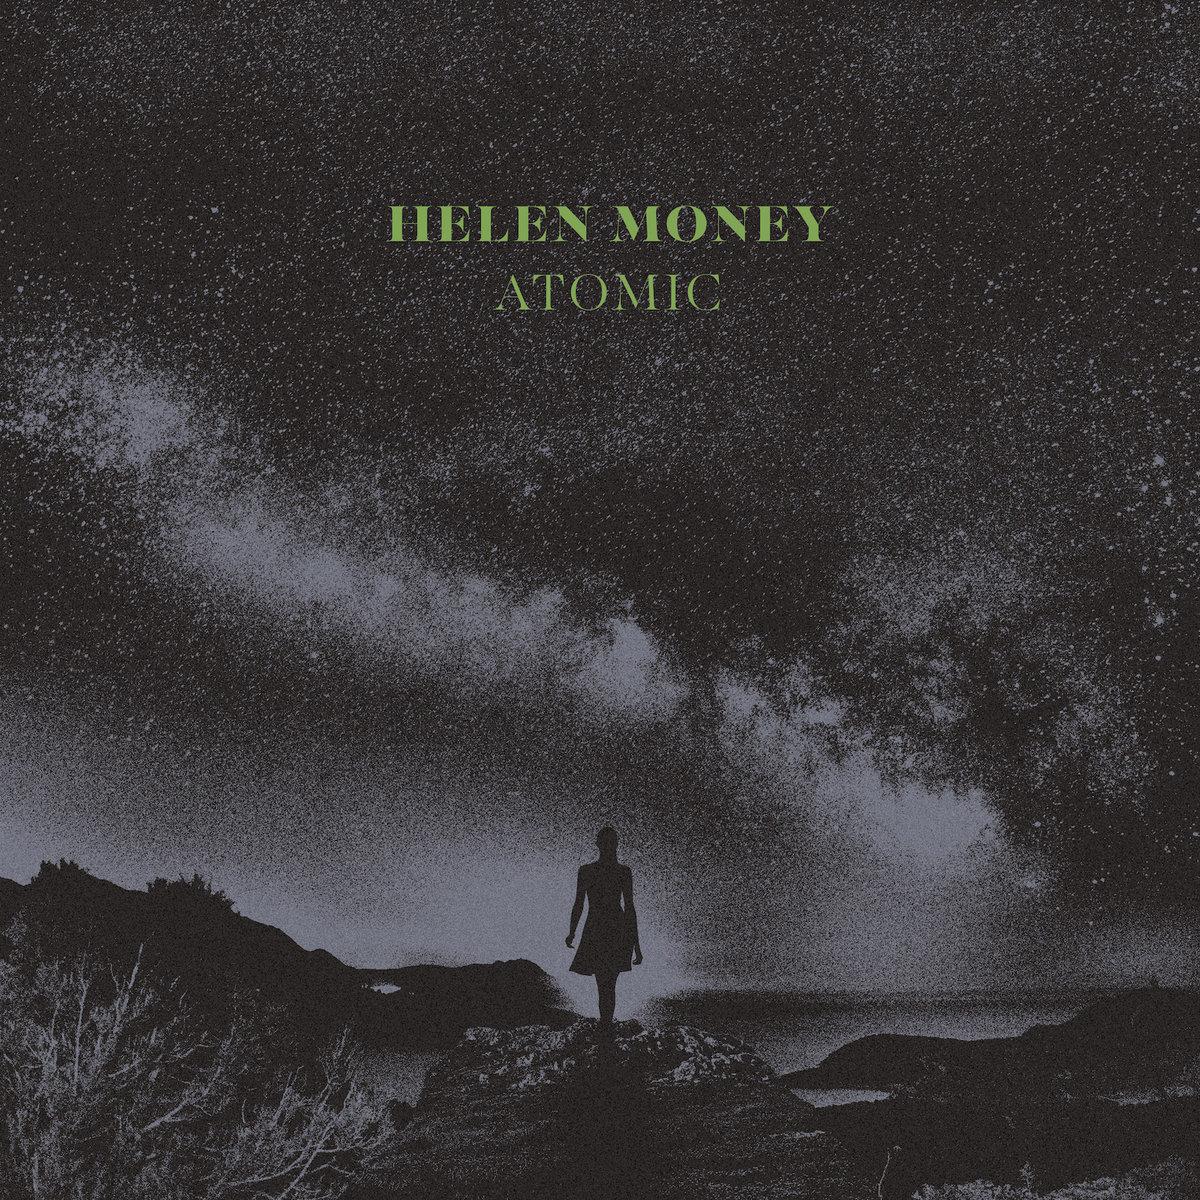 helen money atomic